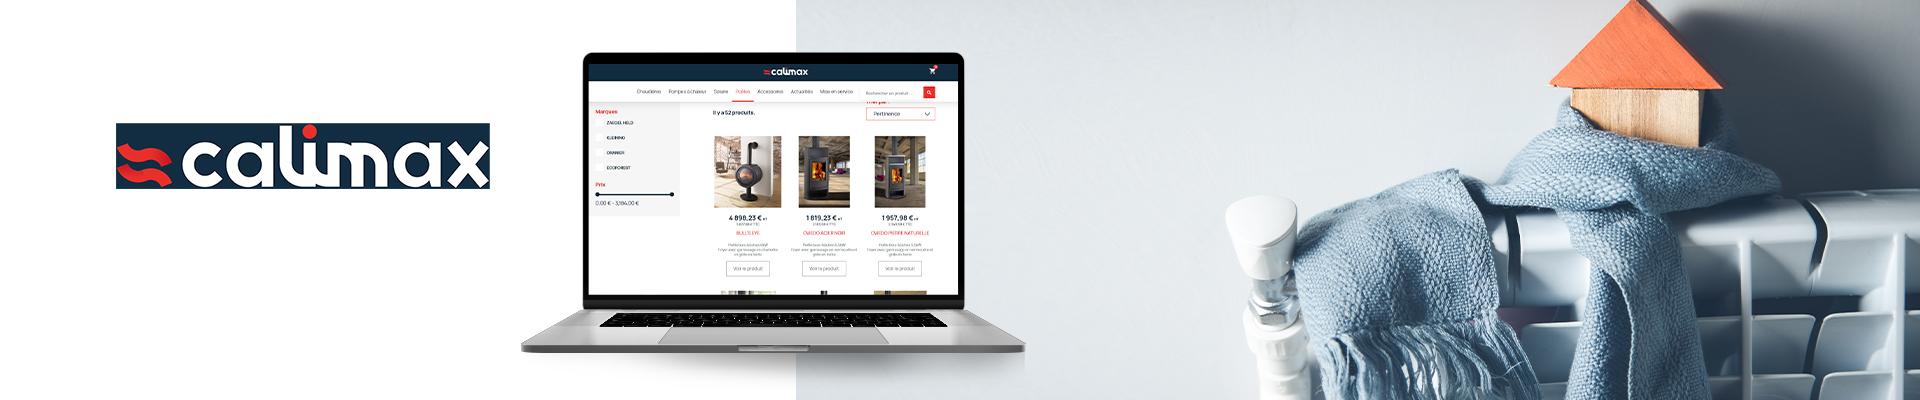 calimax site e-commerce